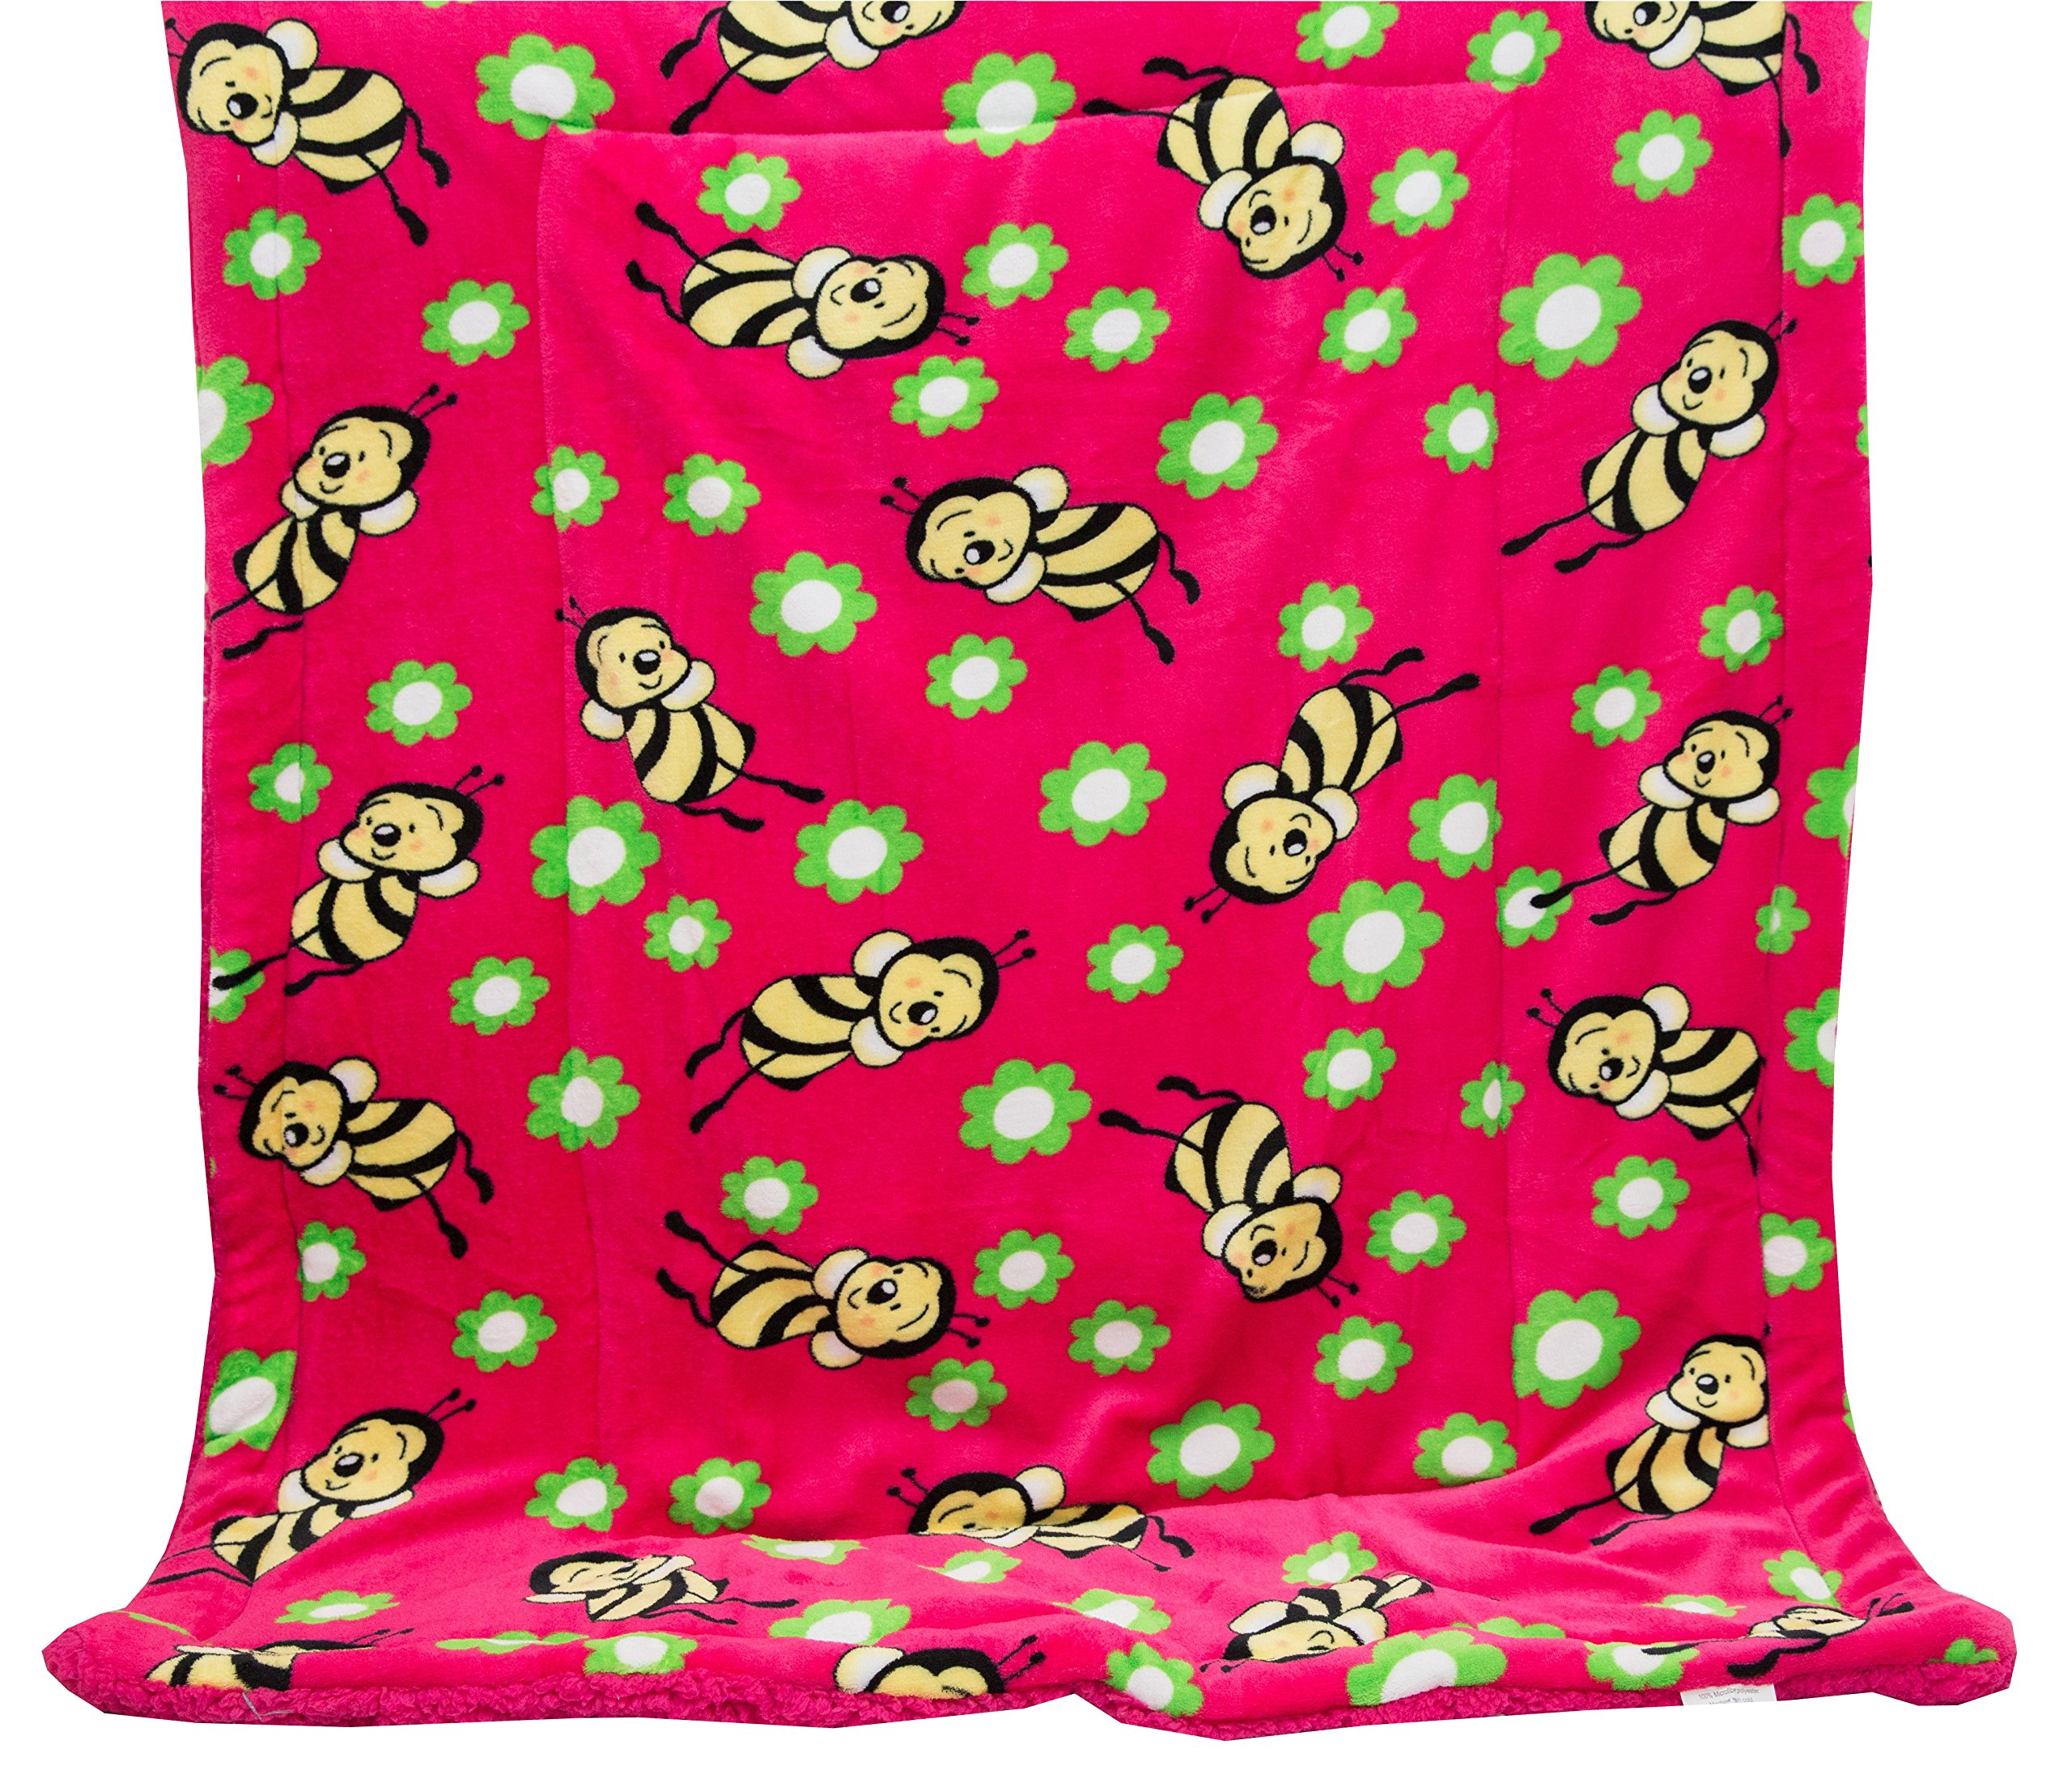 Elegant Home Hot Pink Green Yellow Black Kids Soft & Warm Sherpa Baby Toddler Girl Sherpa Blanket Pink Bee Printed Borrego Stroller or Toddler Bed Blanket Plush Throw 40X50# Pink Bee